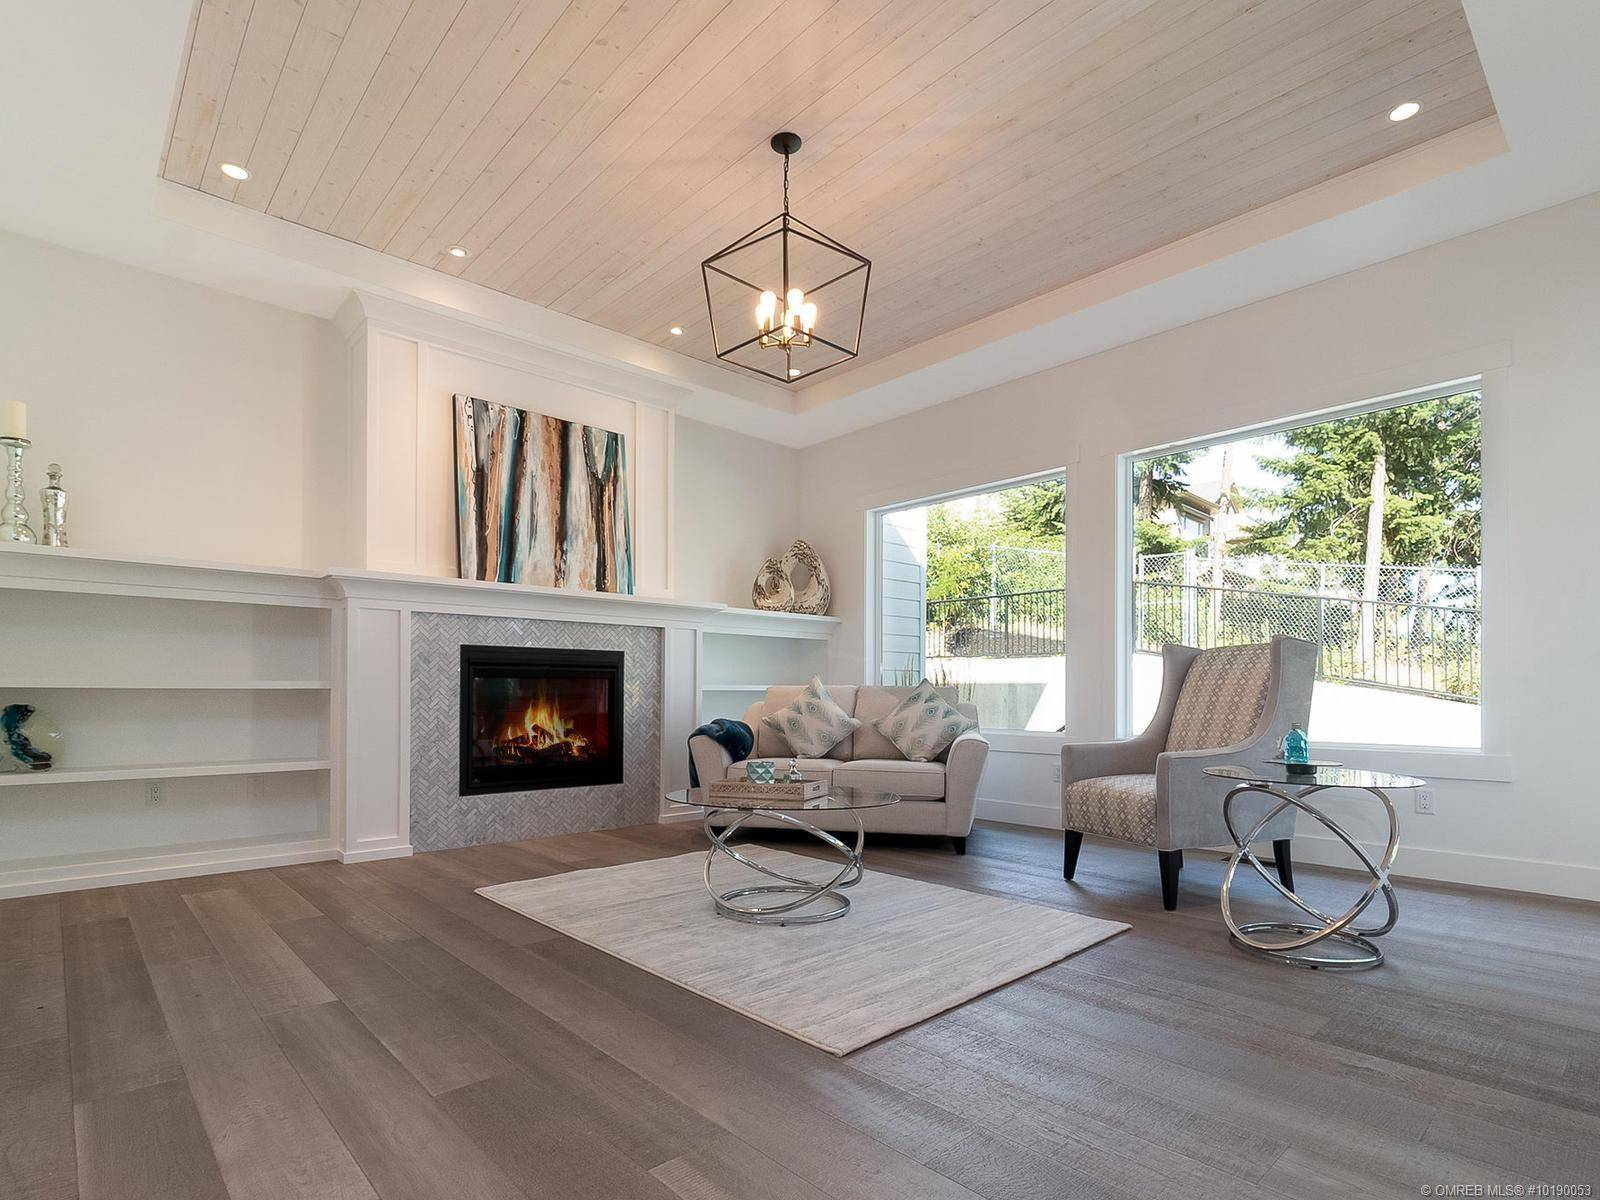 House for sale at 2329 Tallus Green Pl West Kelowna British Columbia - MLS: 10190053